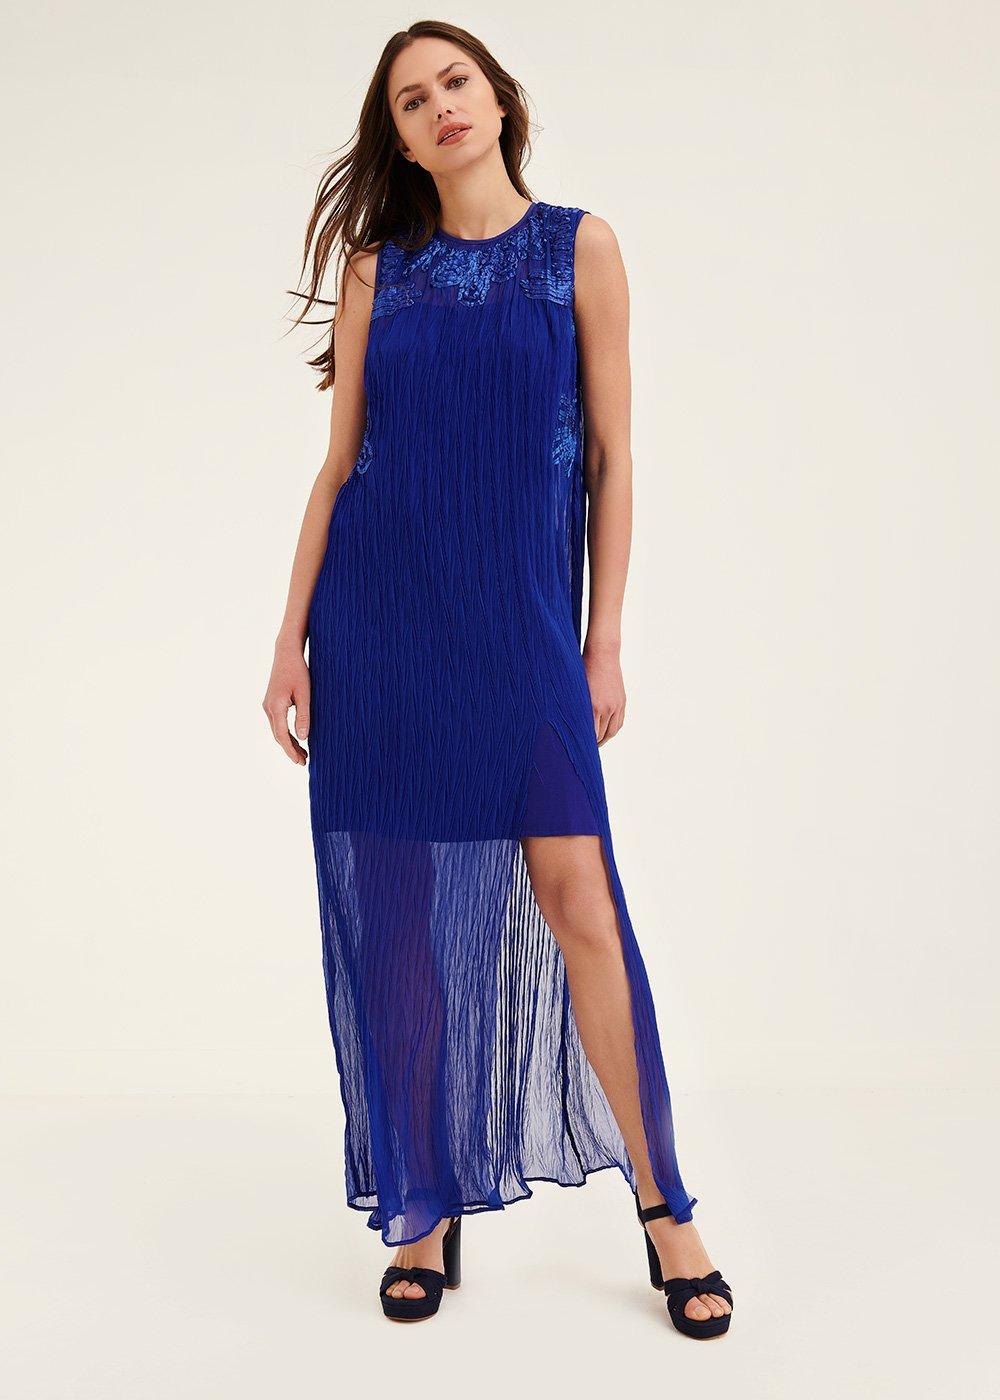 Azur pleated georgette dress - Abisso - Woman